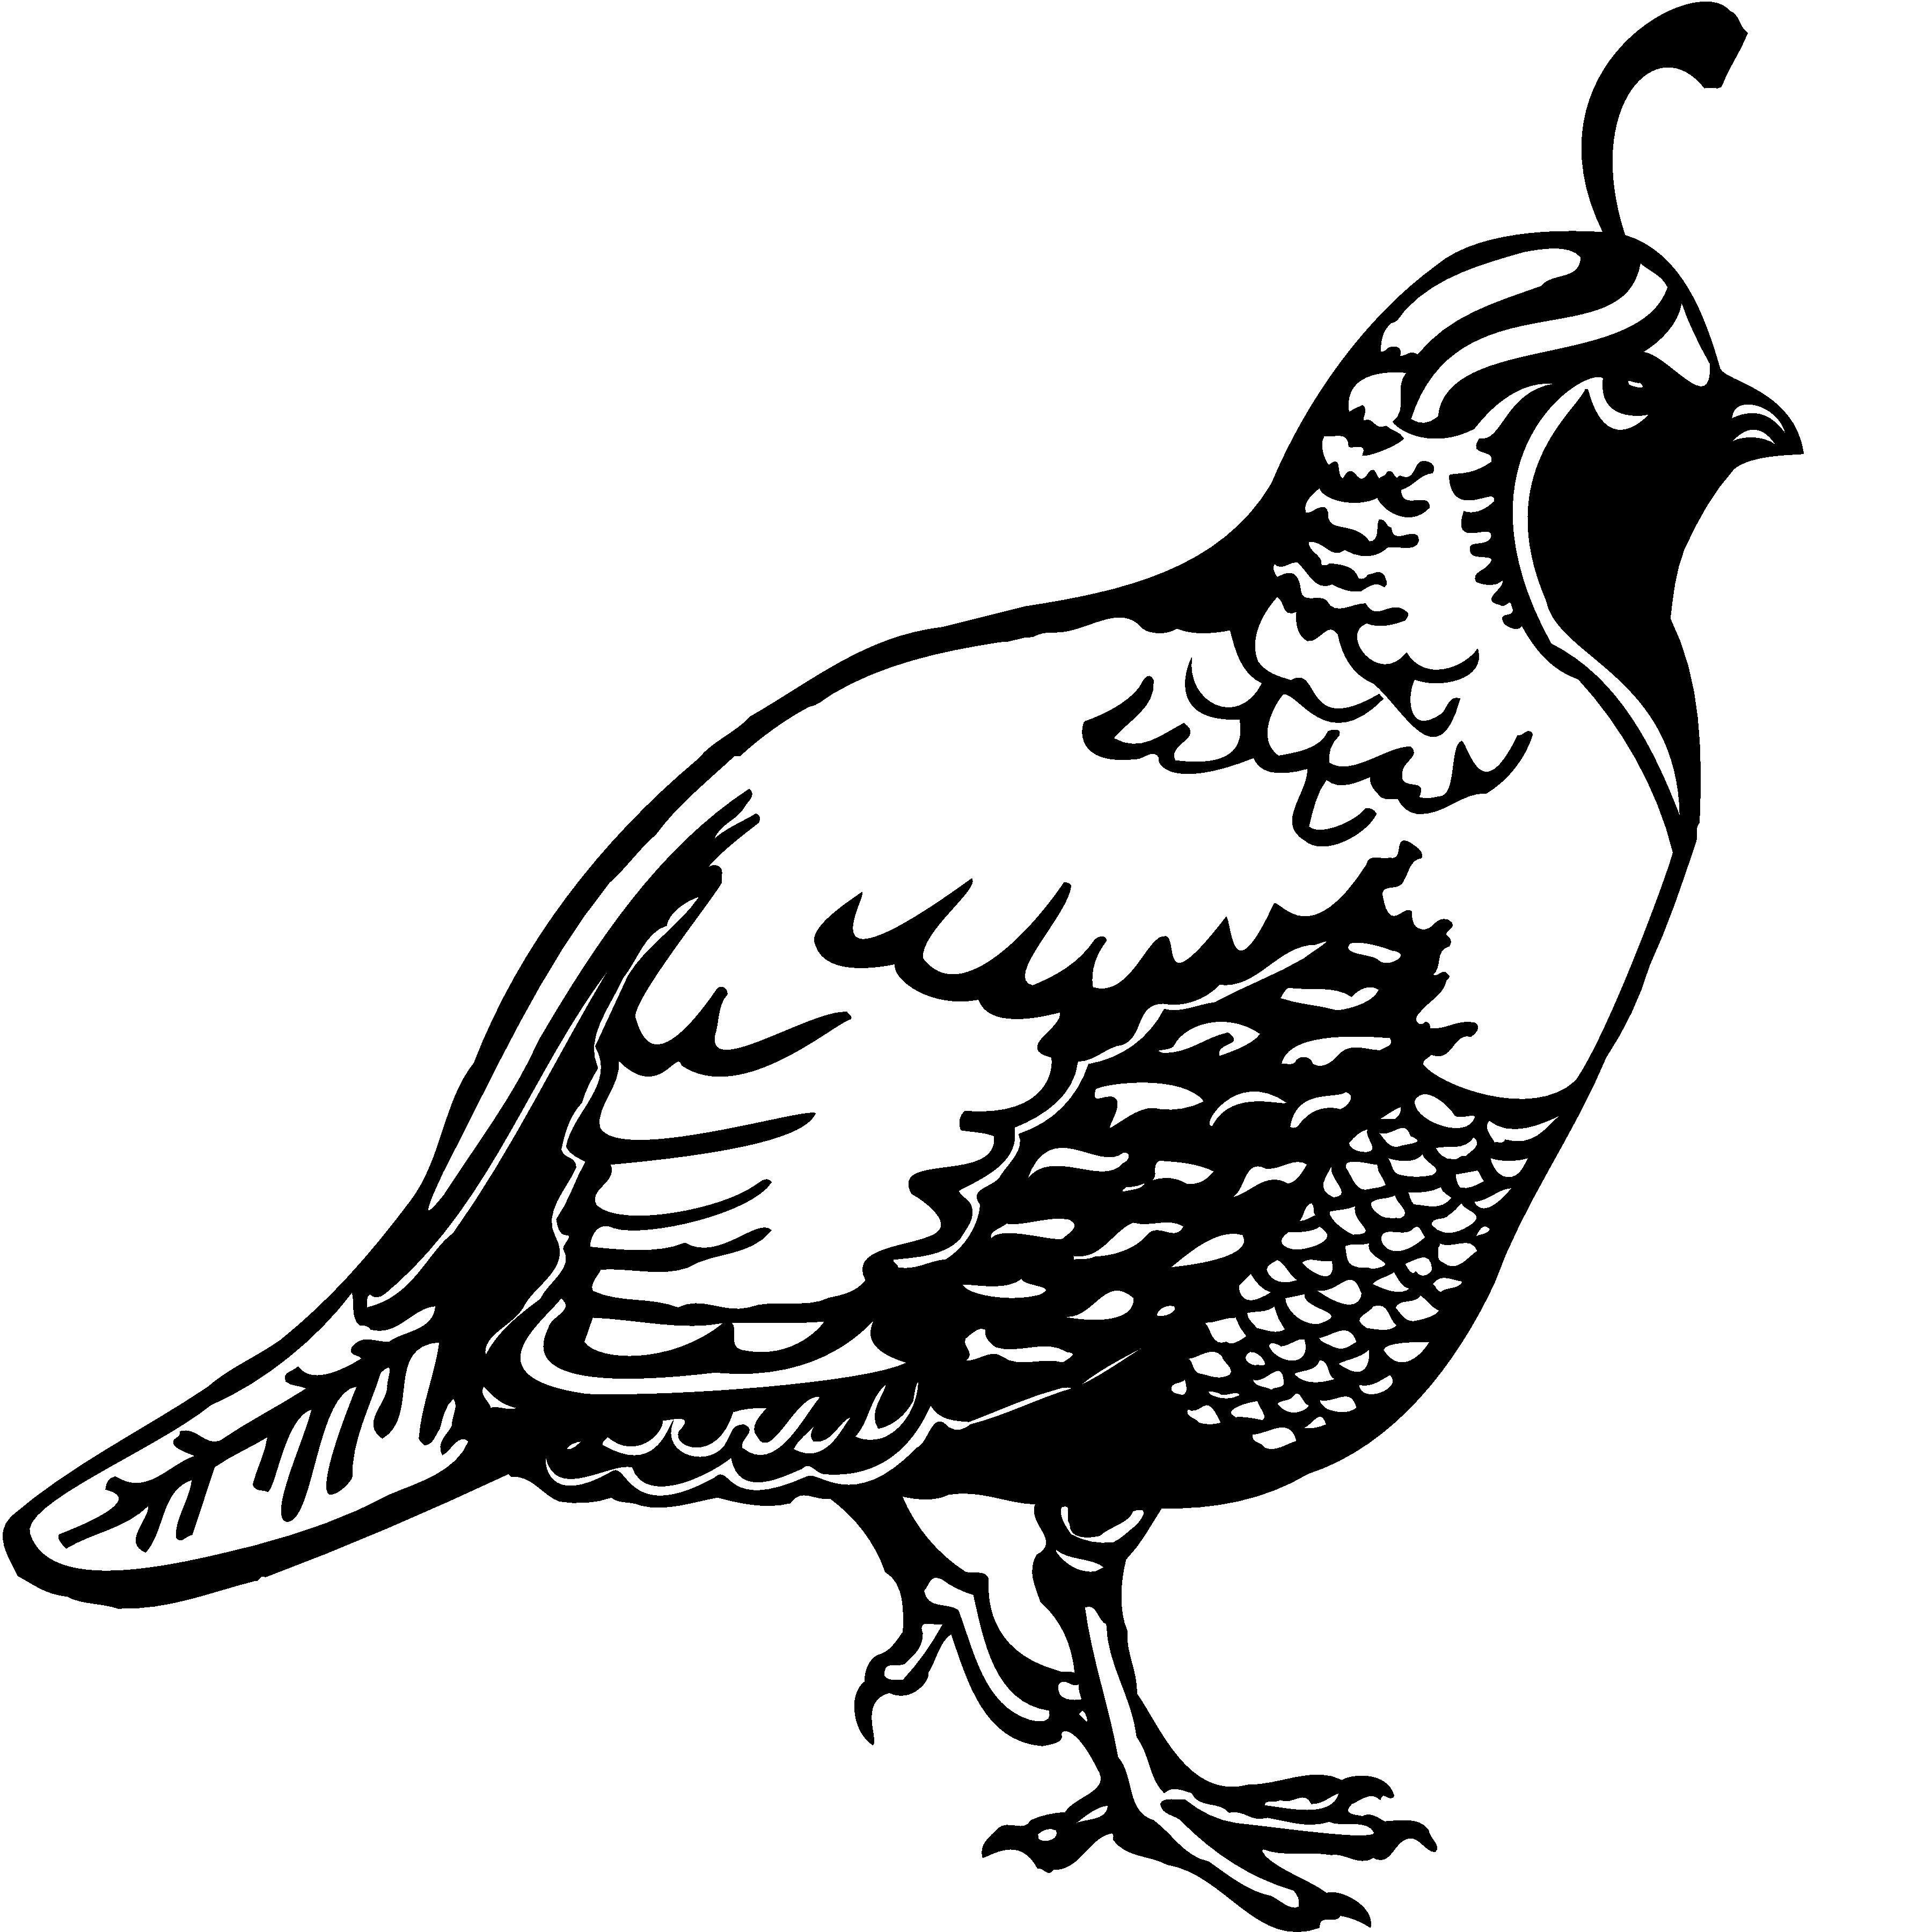 Coloring pages quail - Quail